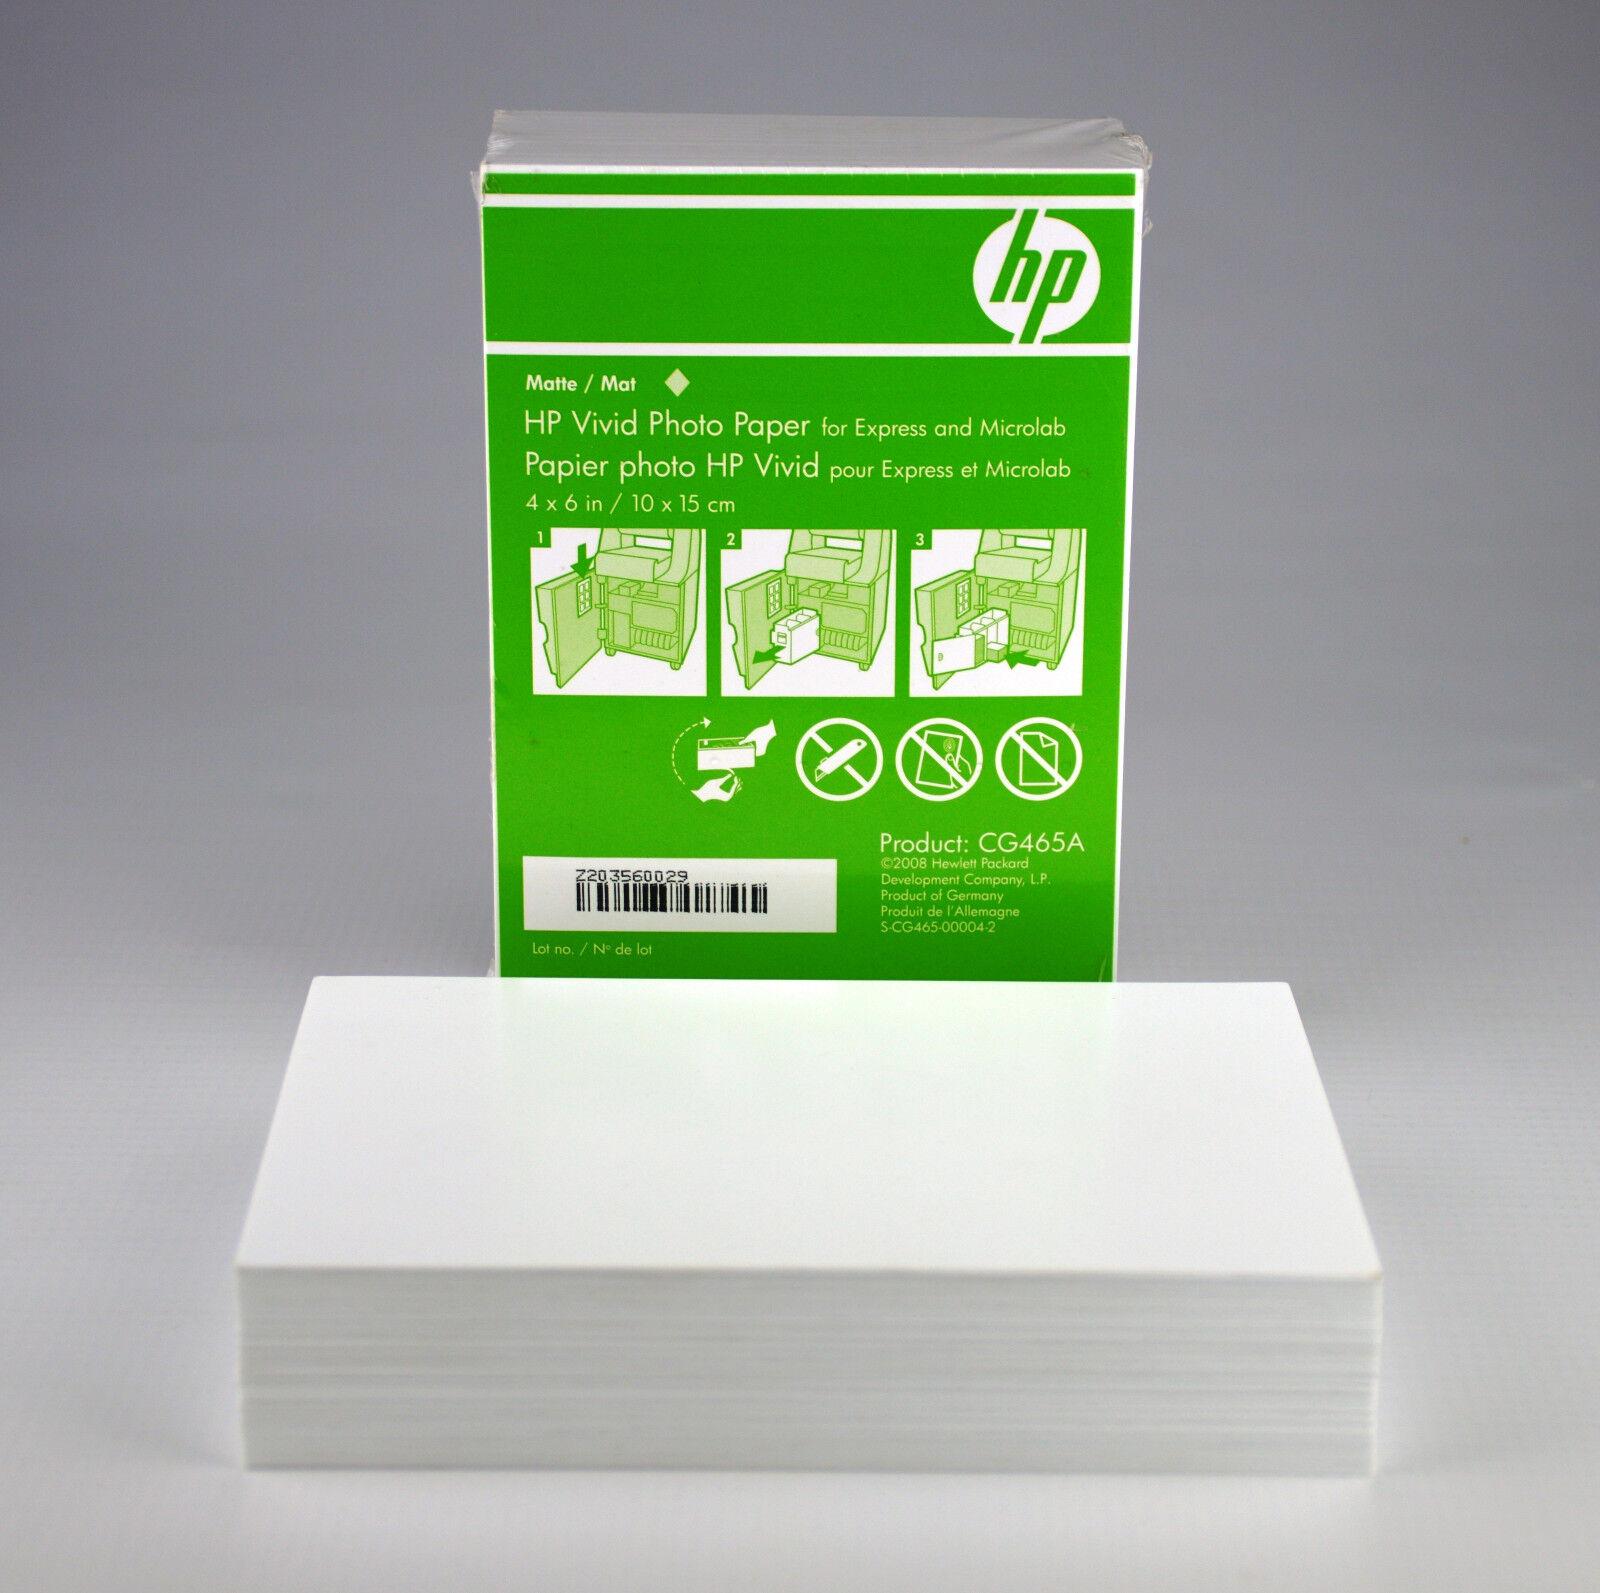 HP parts for CE841A LaserJet Pro M1212nf Multifunction Printer Laserjet photo paper 4x6